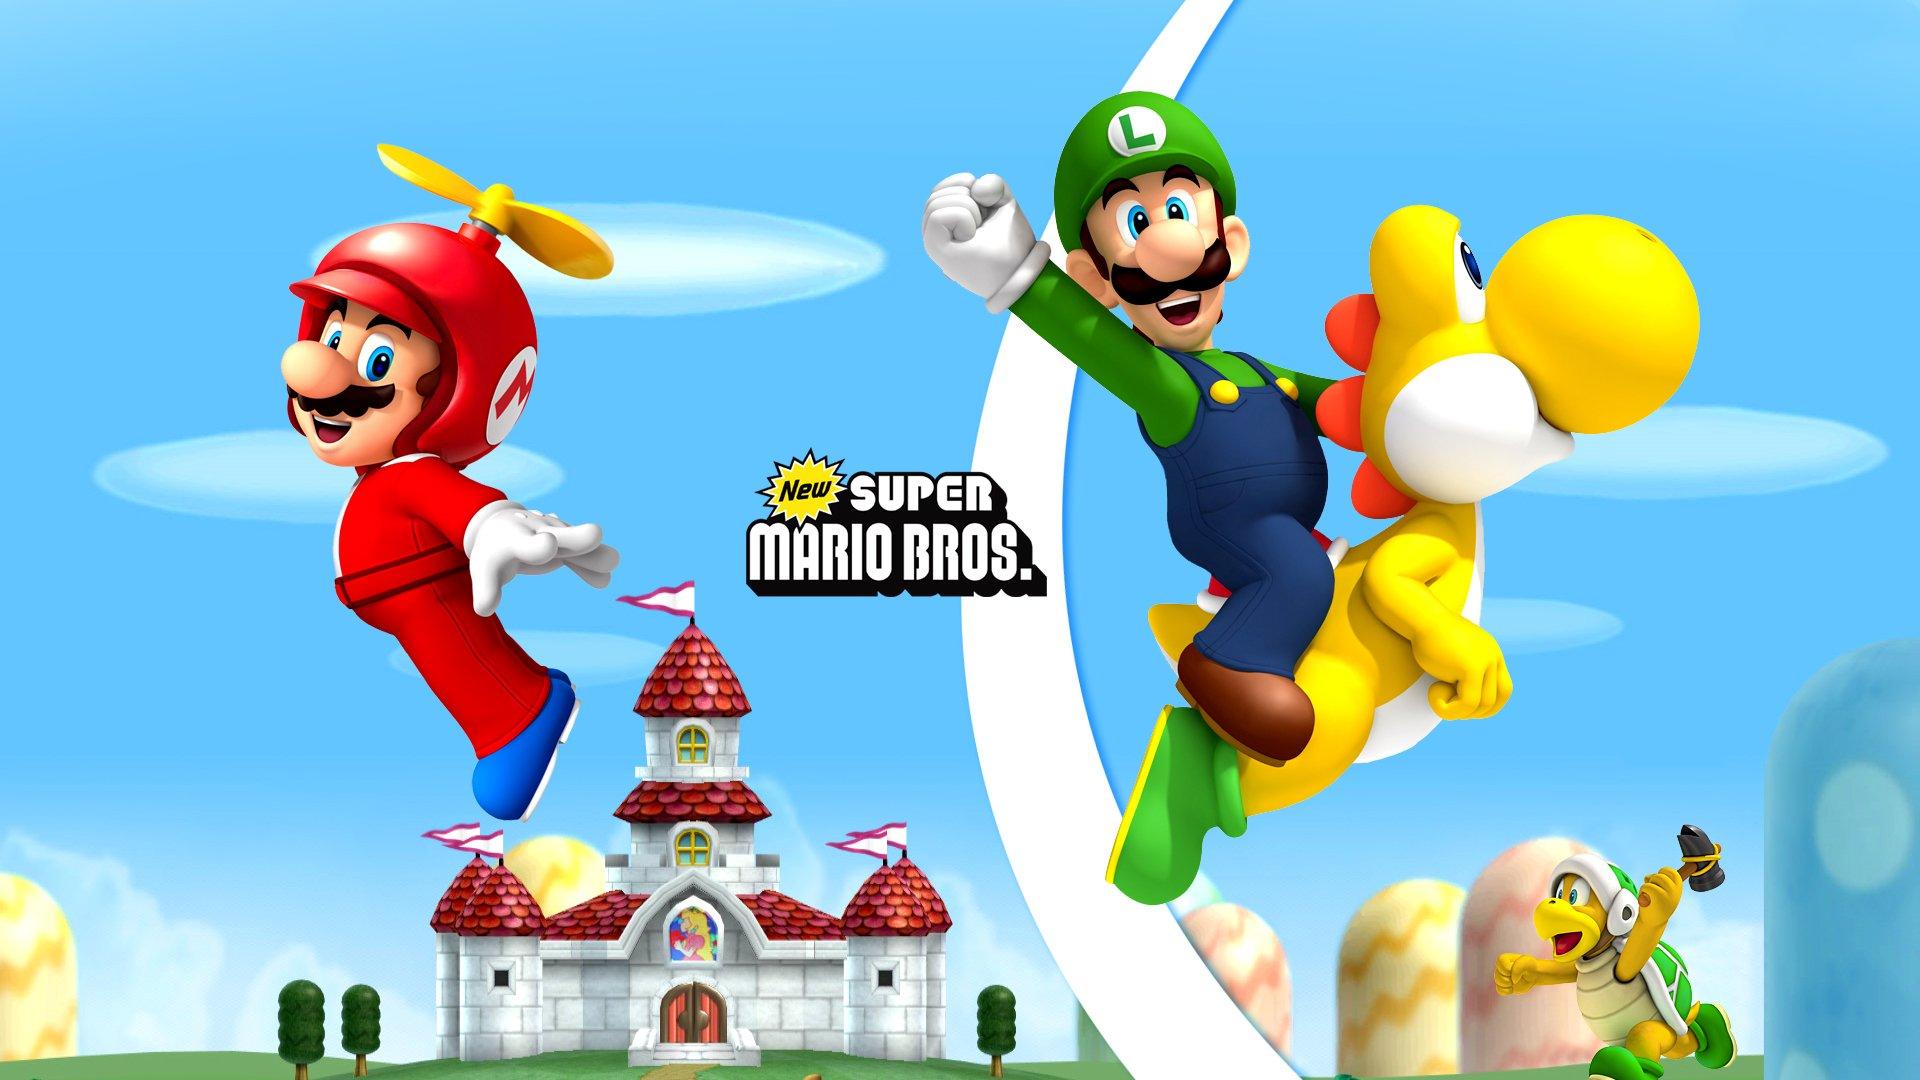 New Super Mario Bros Wii Hd Wallpaper Background Image